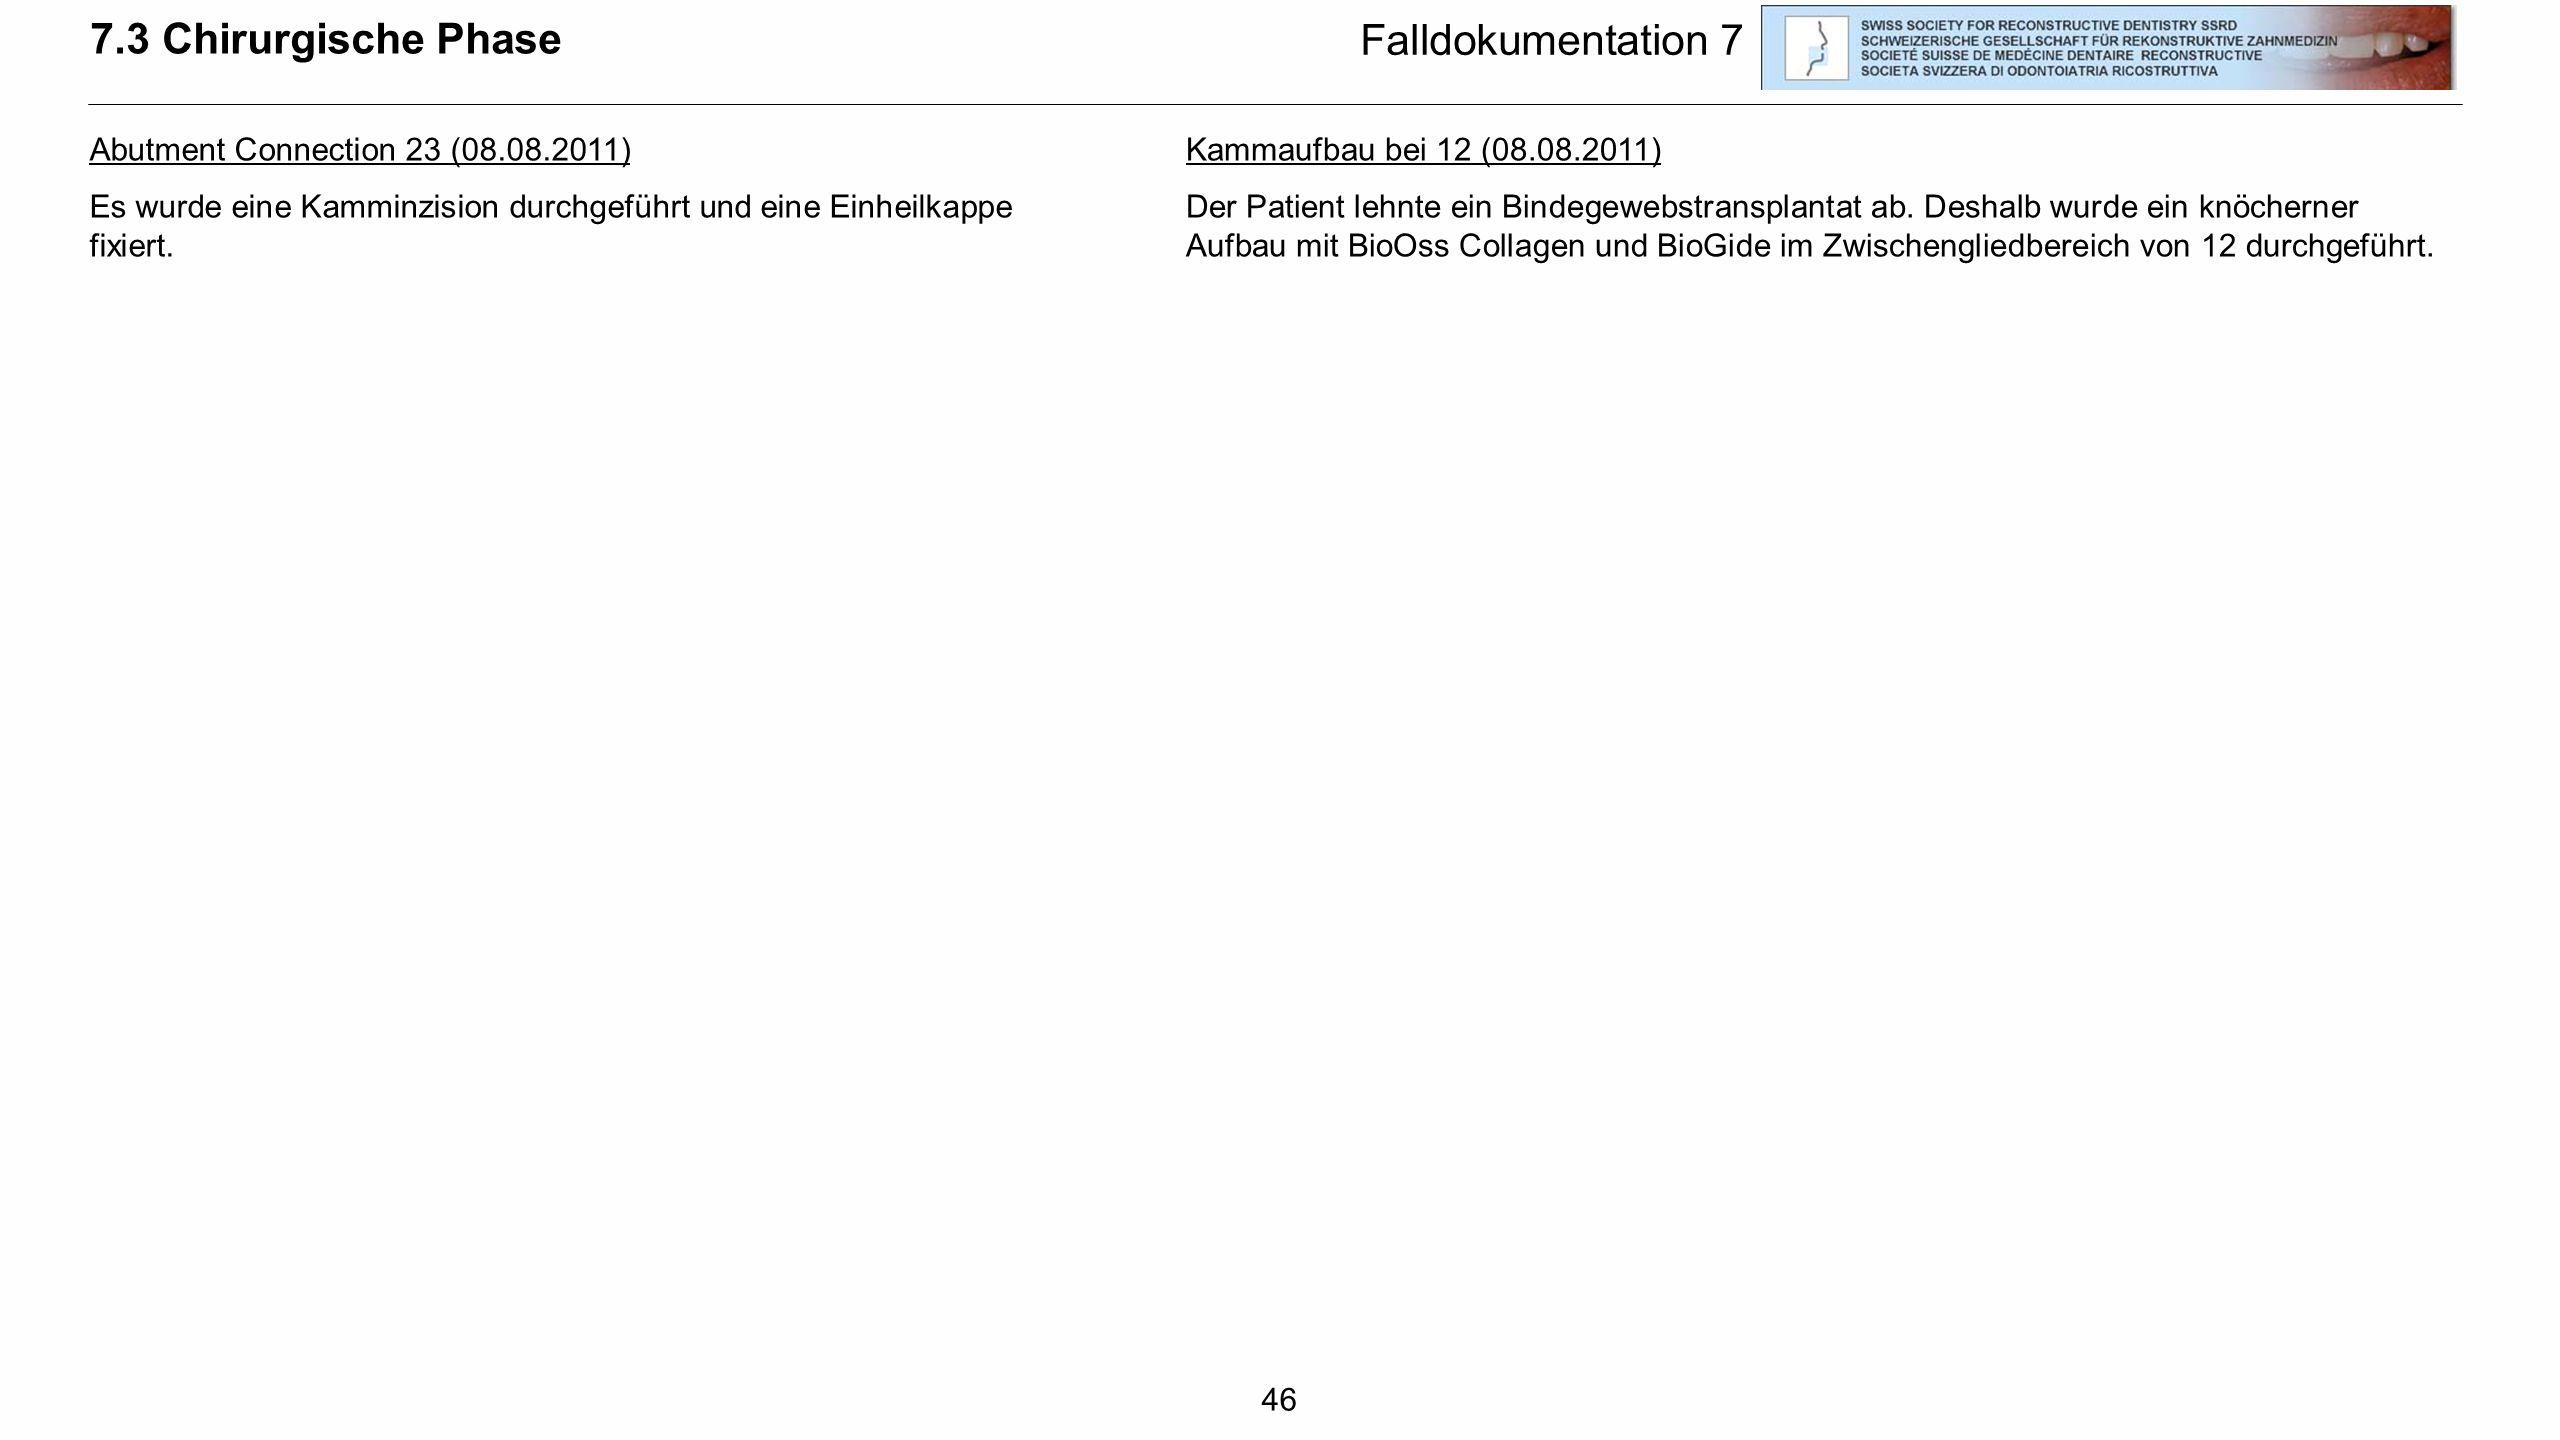 7.3 Chirurgische Phase Falldokumentation 7